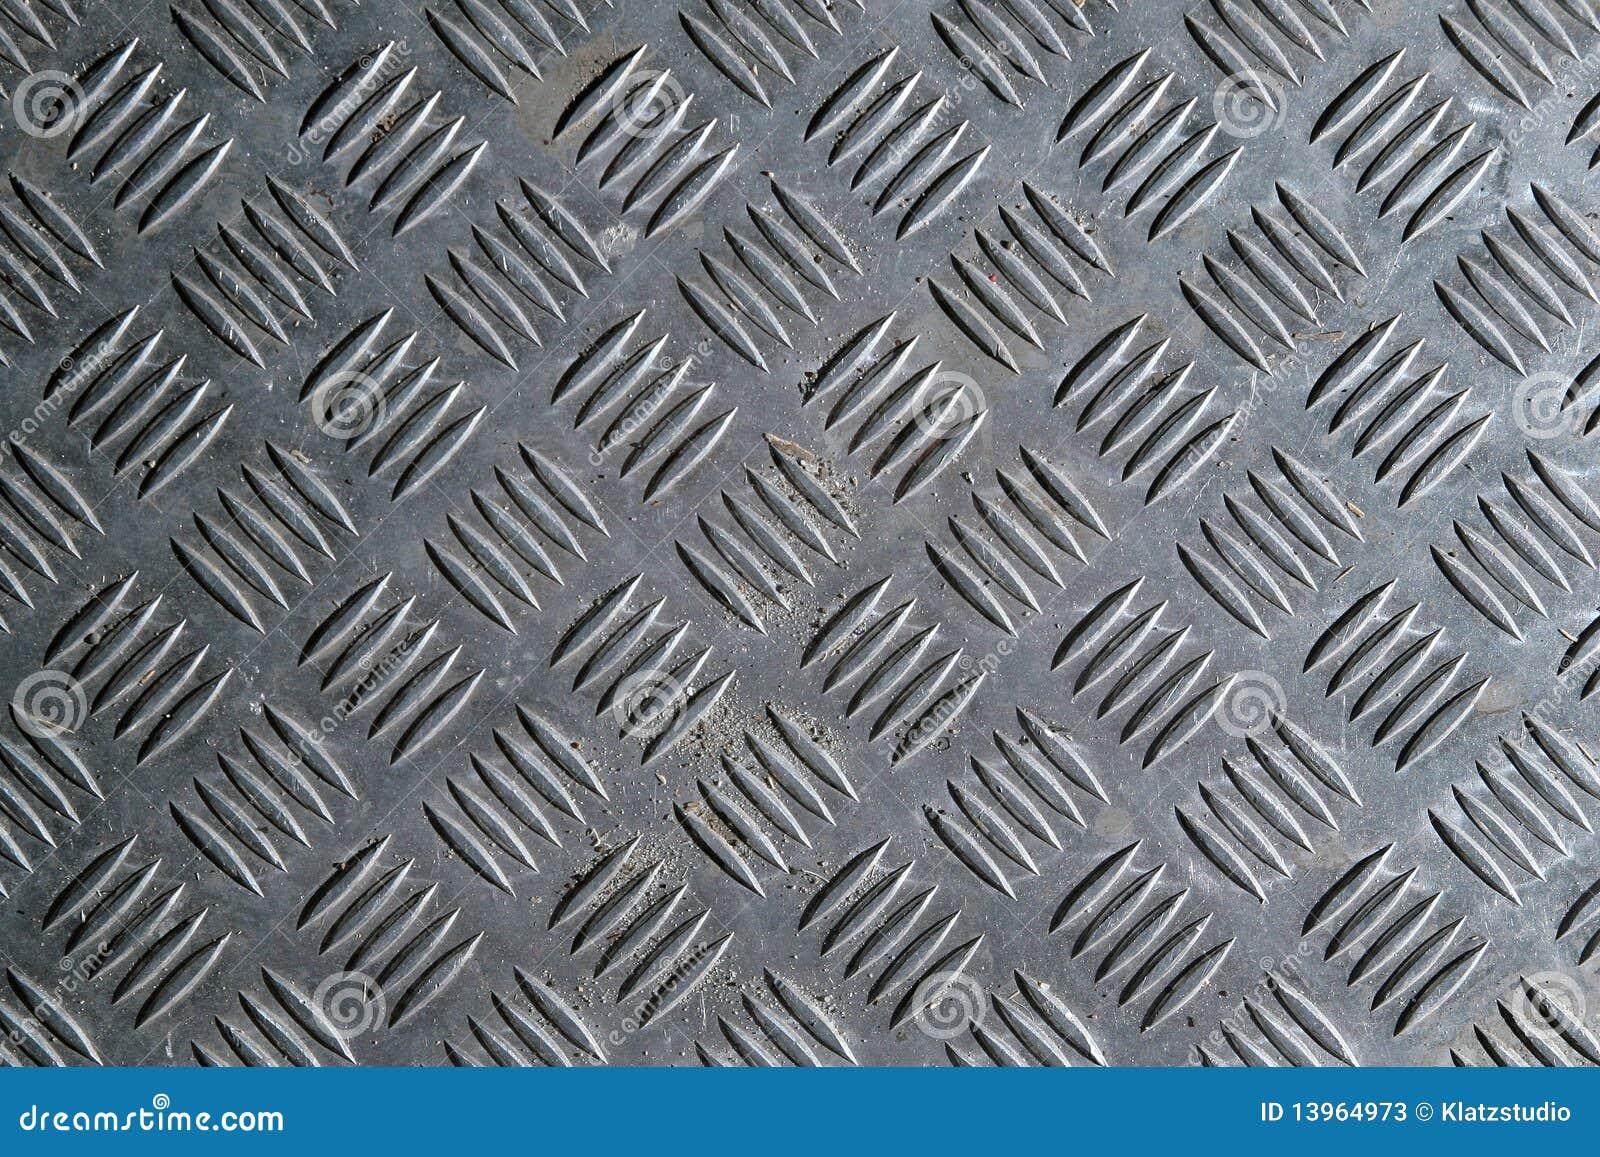 Iron Floor Stock Image Image Of Steel Plate